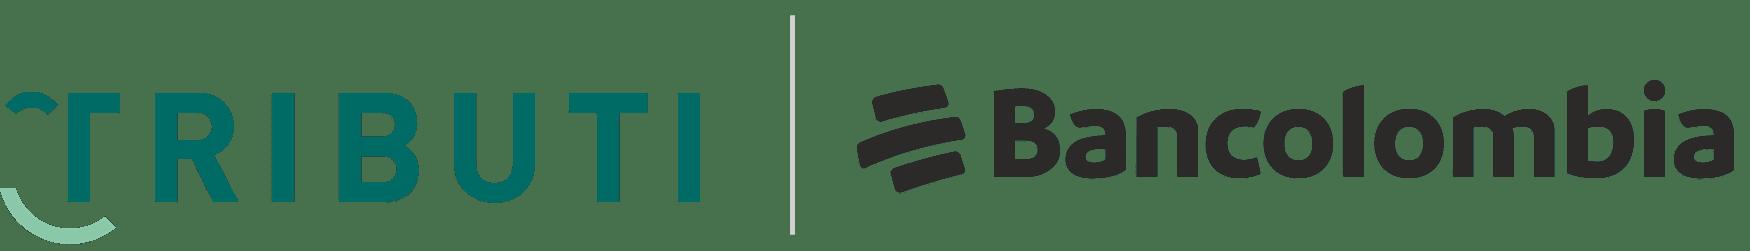 Logo tributi y bancolombia